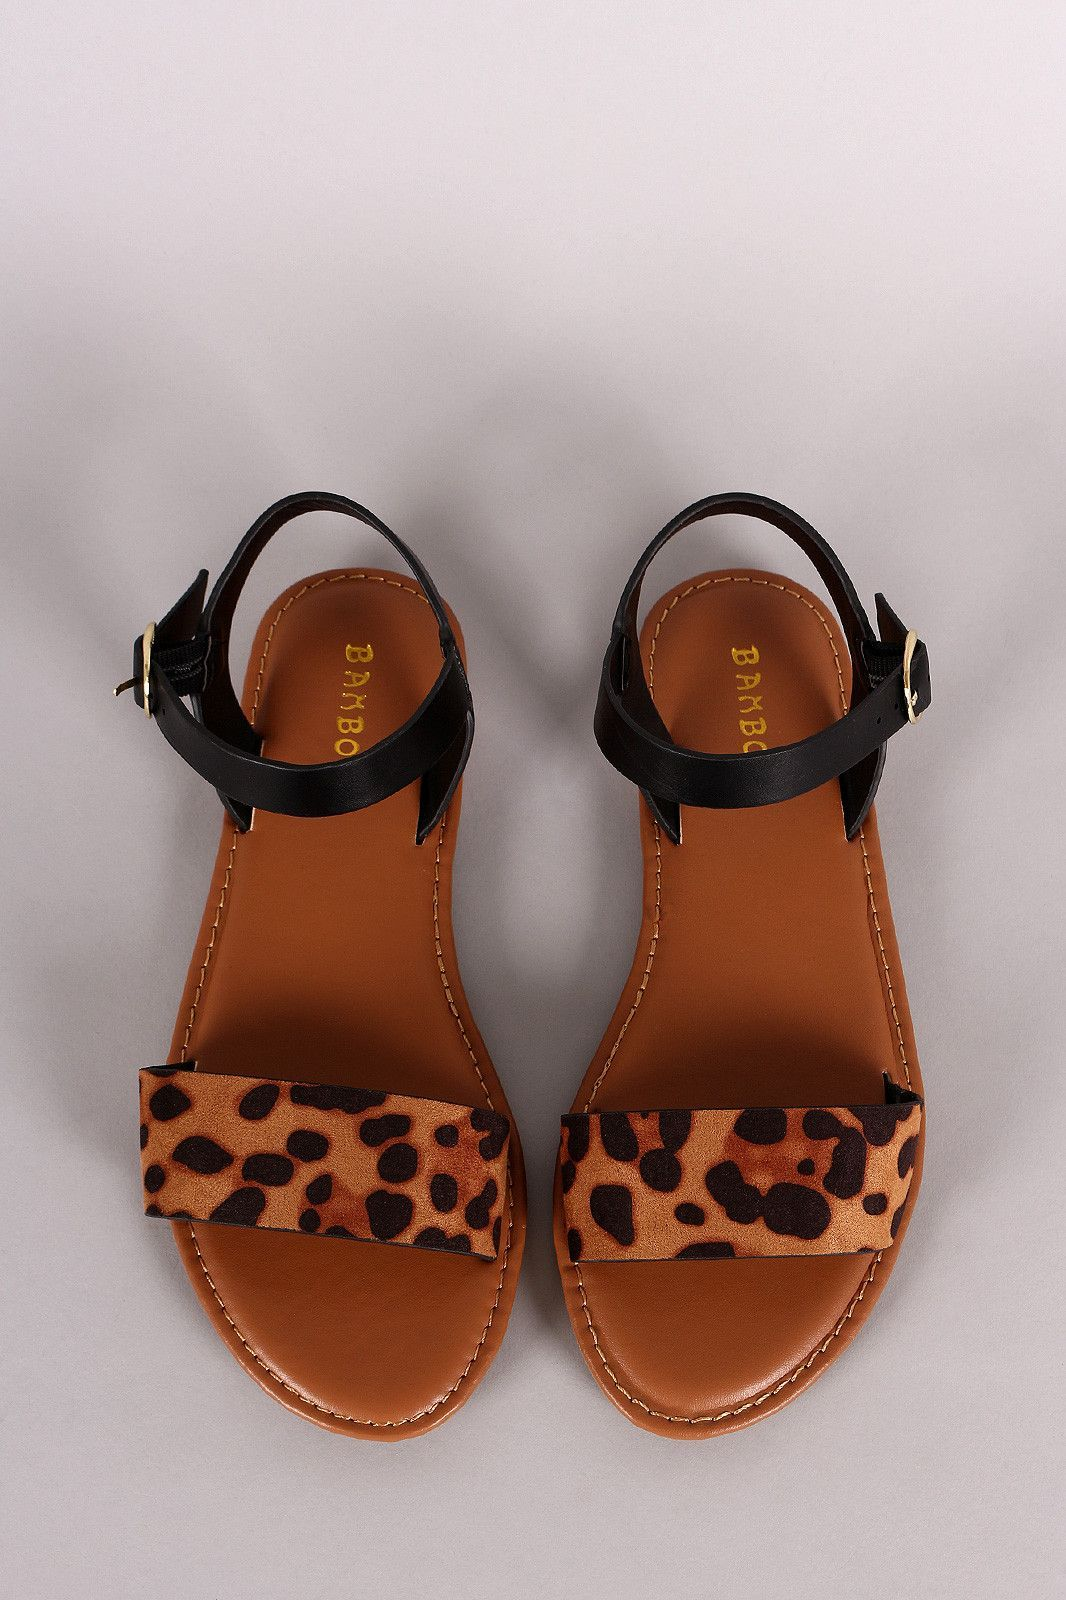 c626e31e7fd5 DailyDeal GloFX Clear Kaleidoscope Glasses - Rainbow | shoes | Ankle ...